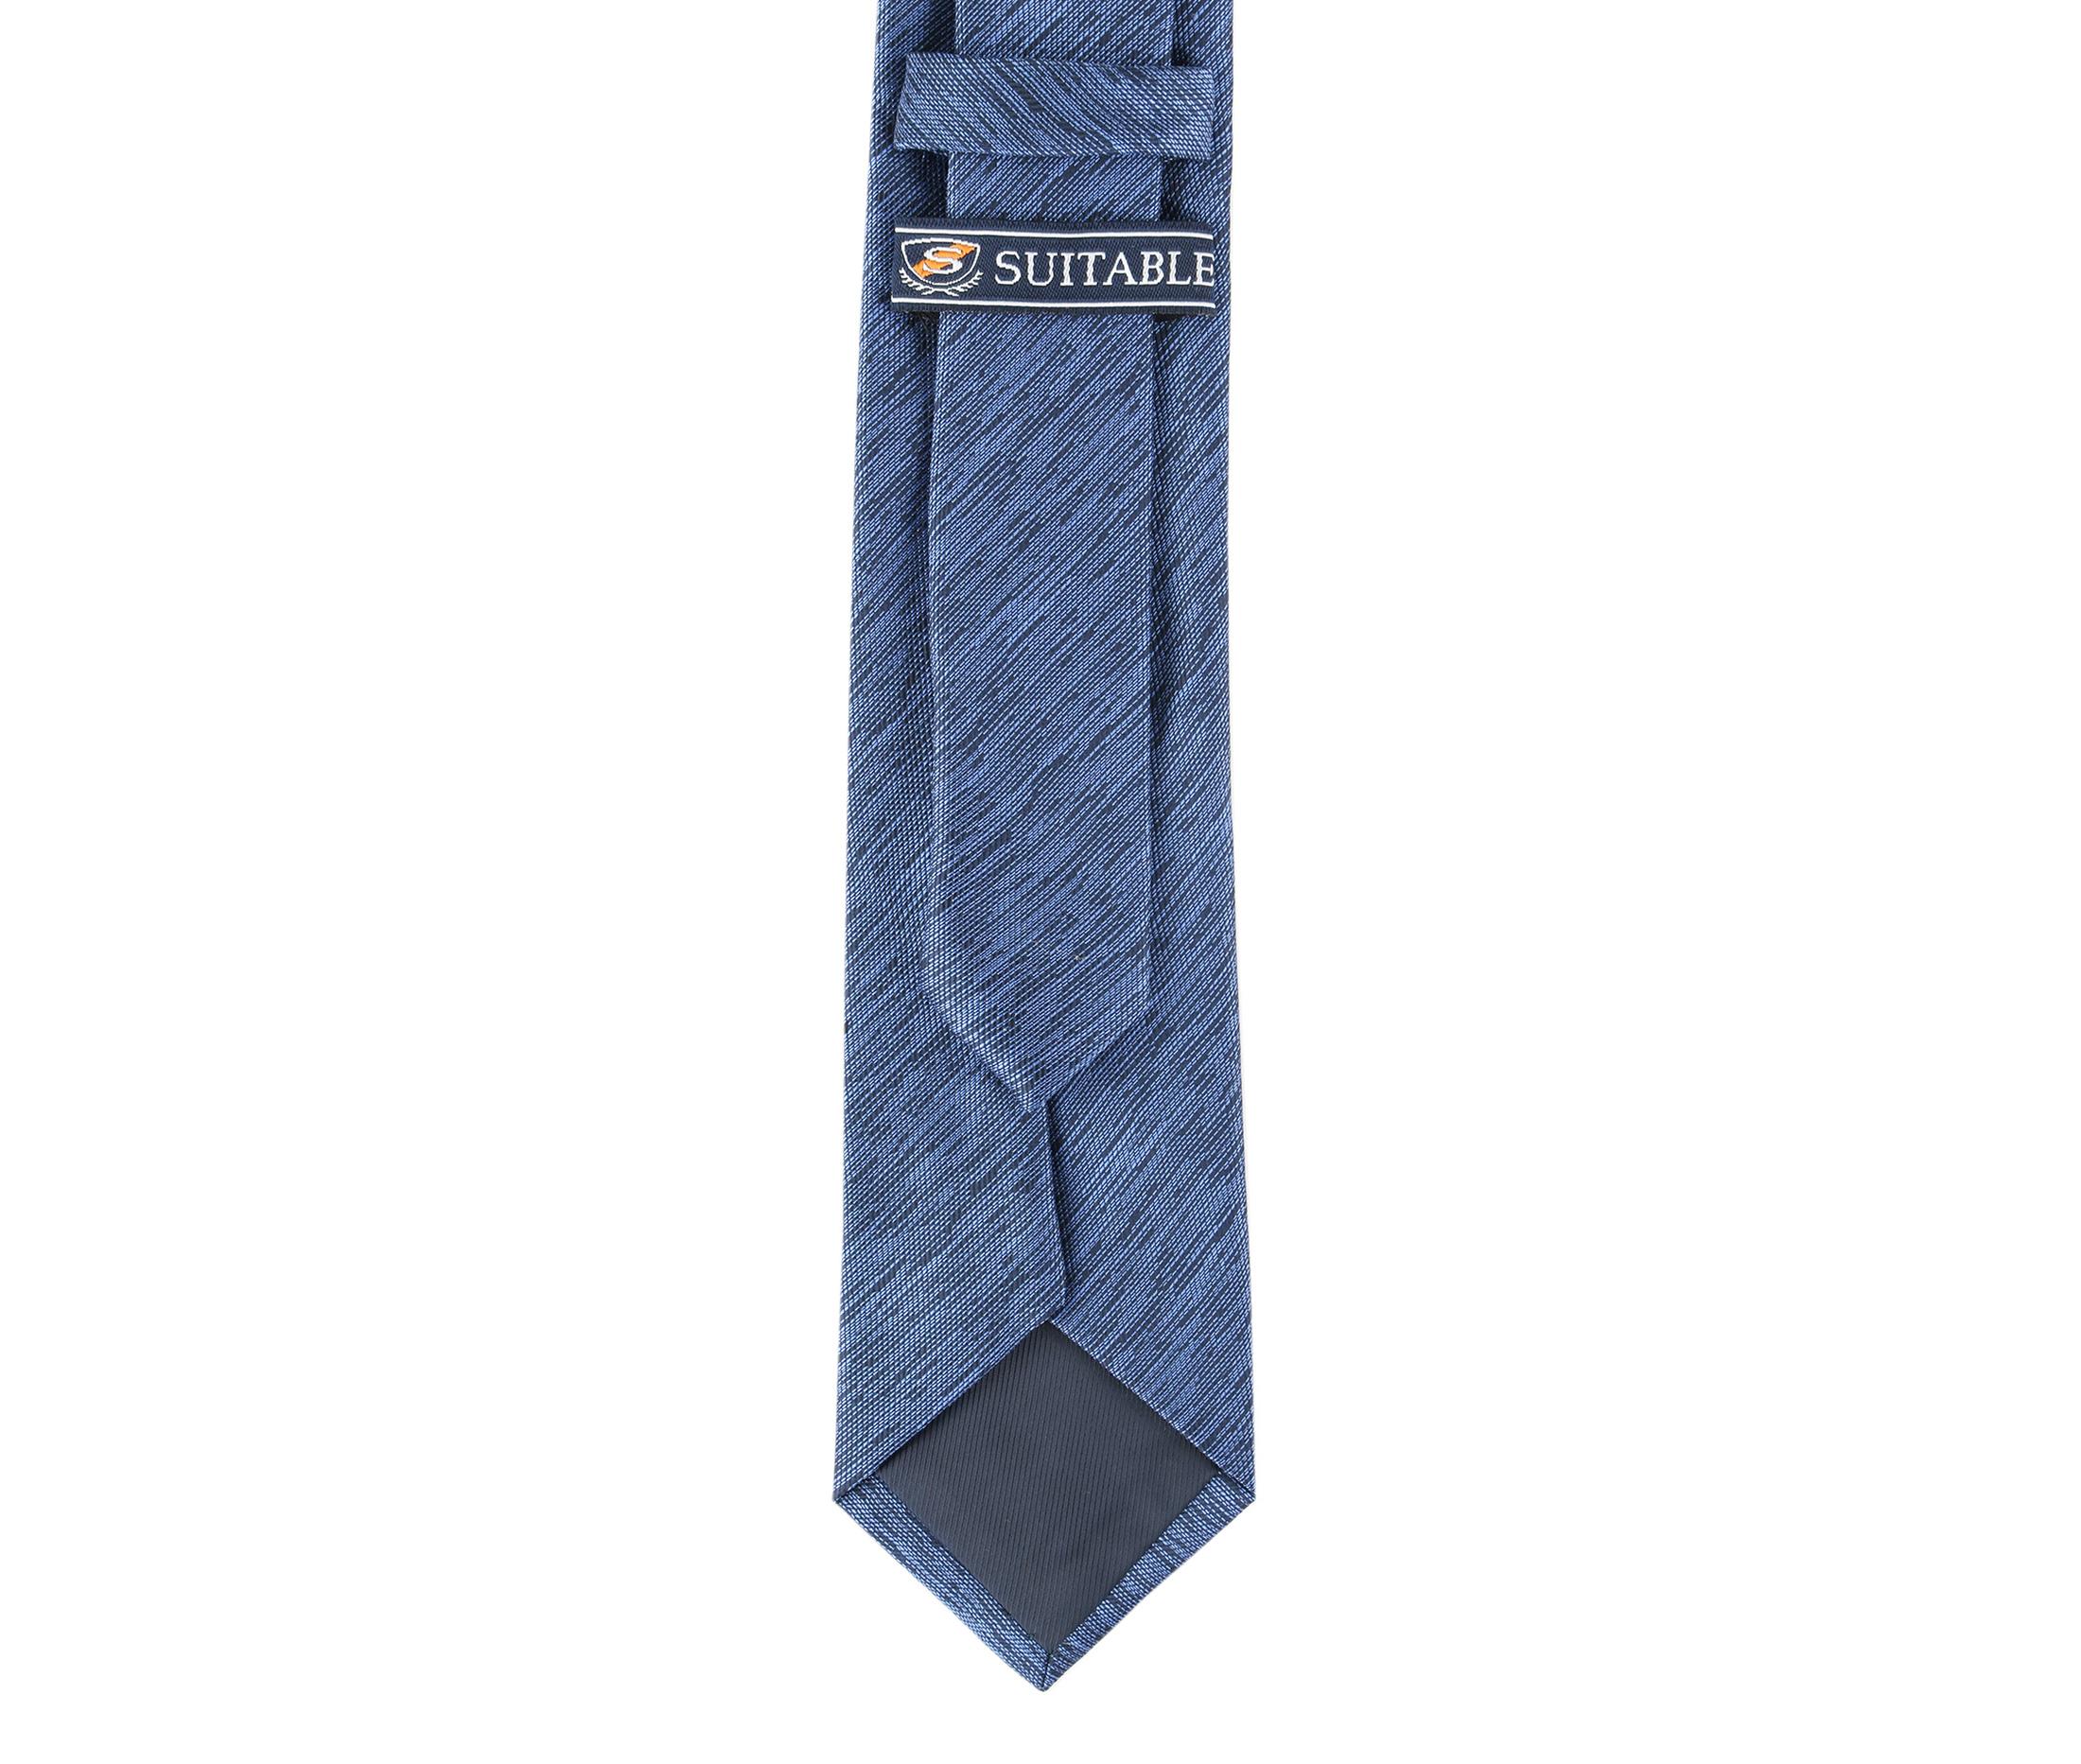 Krawatte Seide Blue 9-17 foto 3